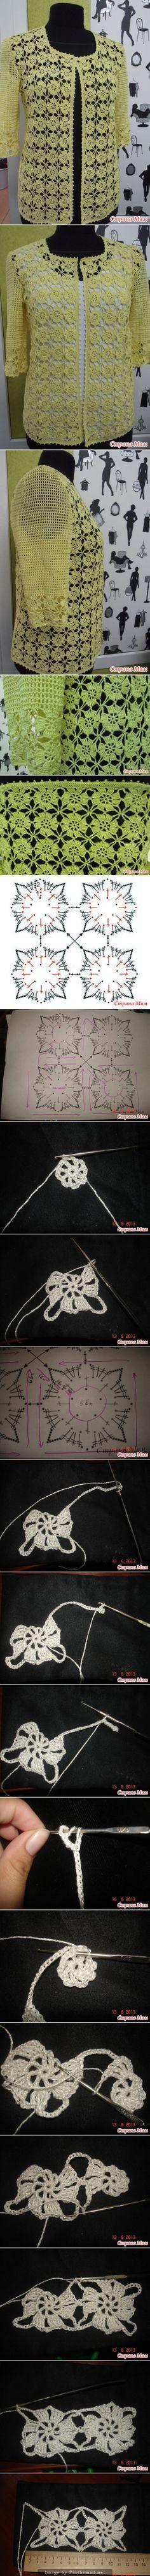 Crochet motif top pullover jac | <br/>    Crochet